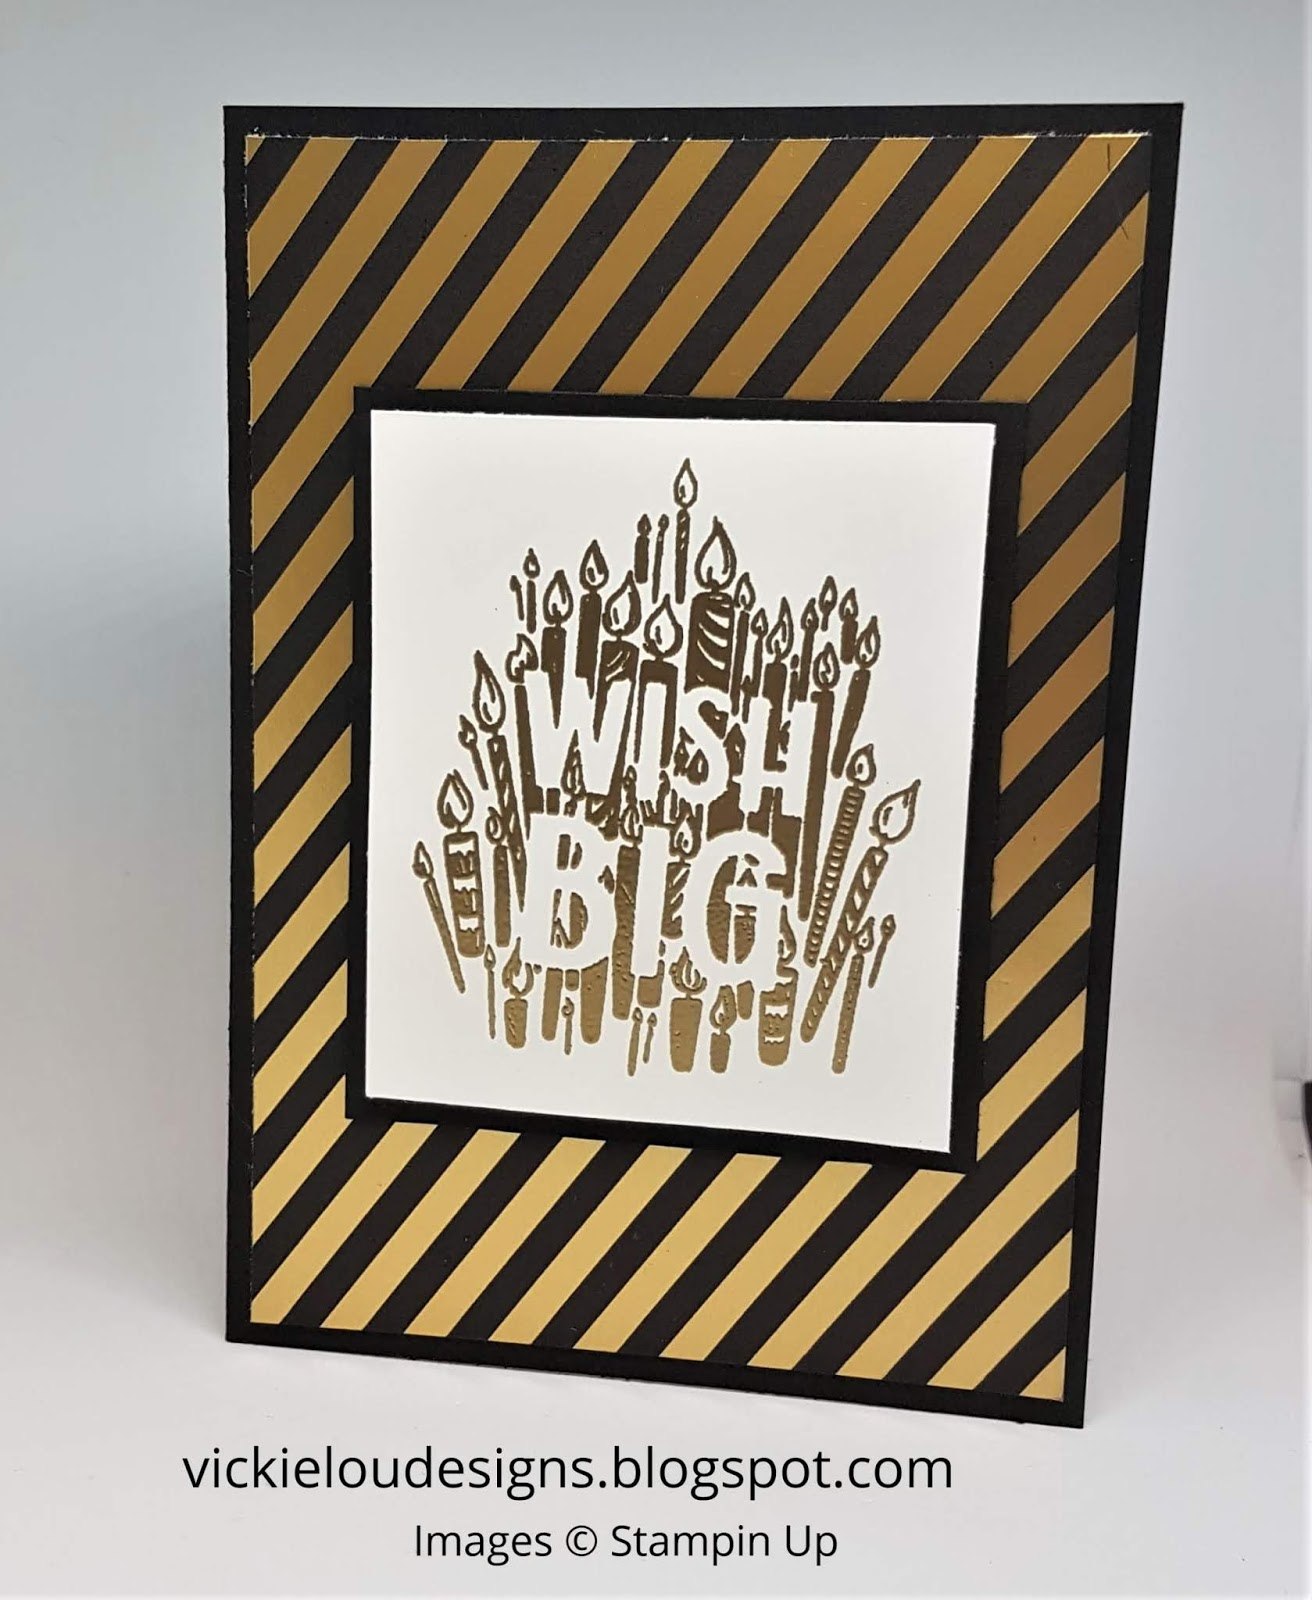 Vickie Lou Designs Big Wishes Broadway Bound Birthday Card